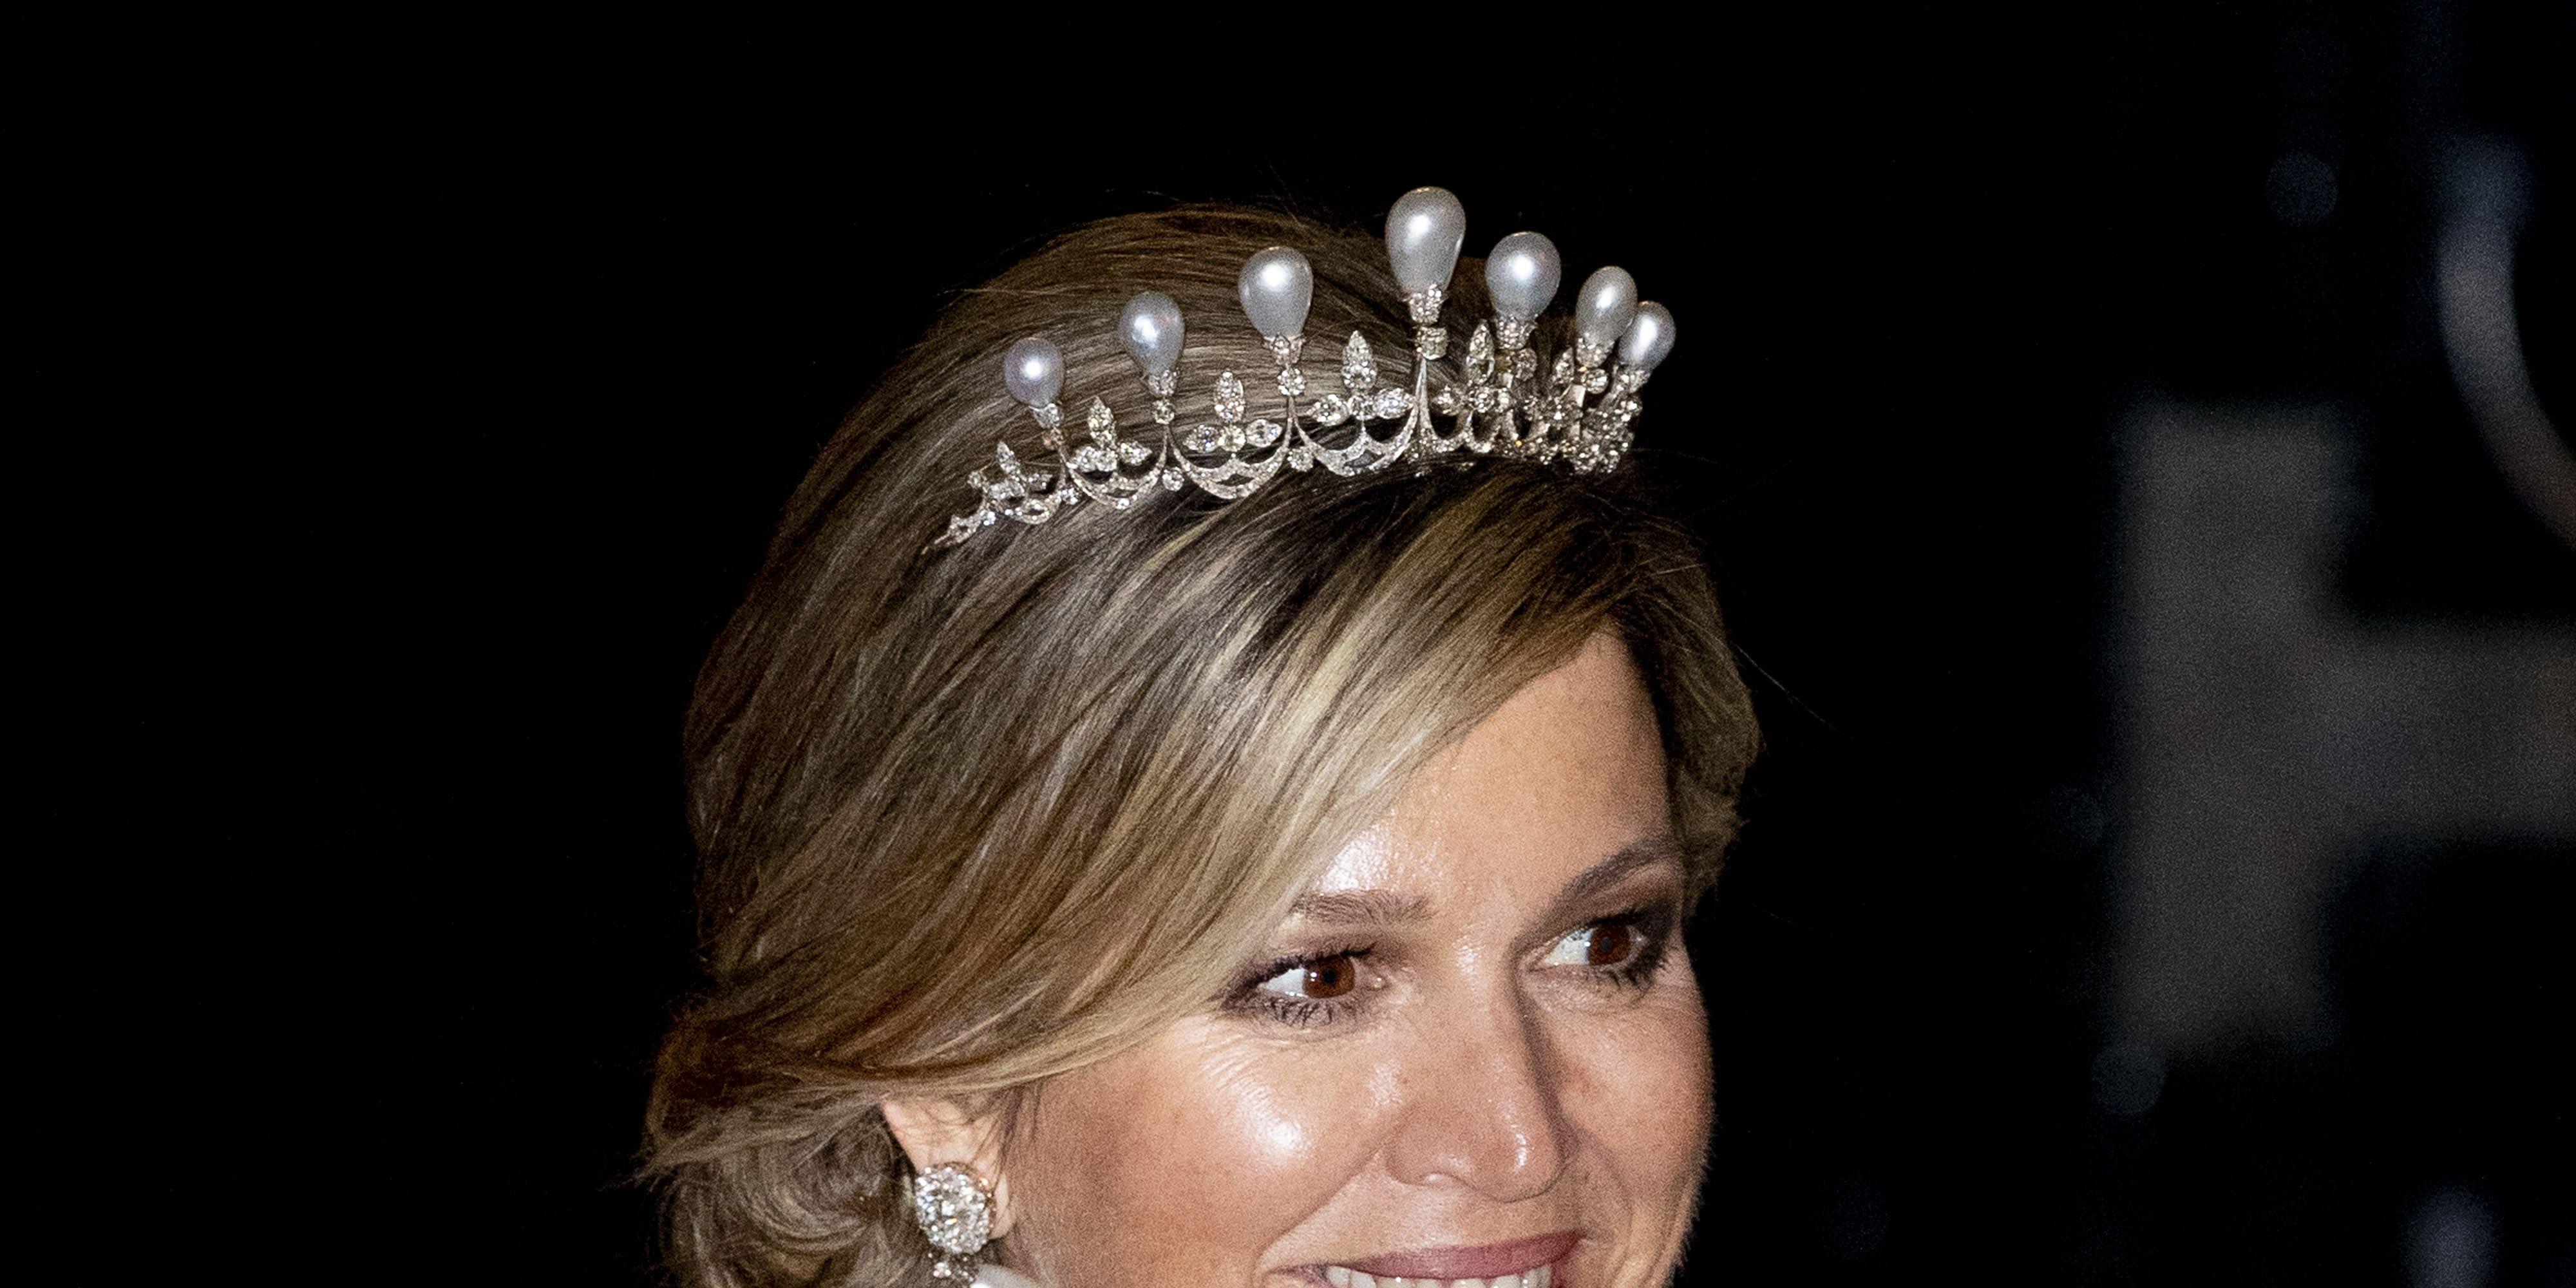 Koningin-maxima-jurk-stella-mccartney-Corps Diplomatique